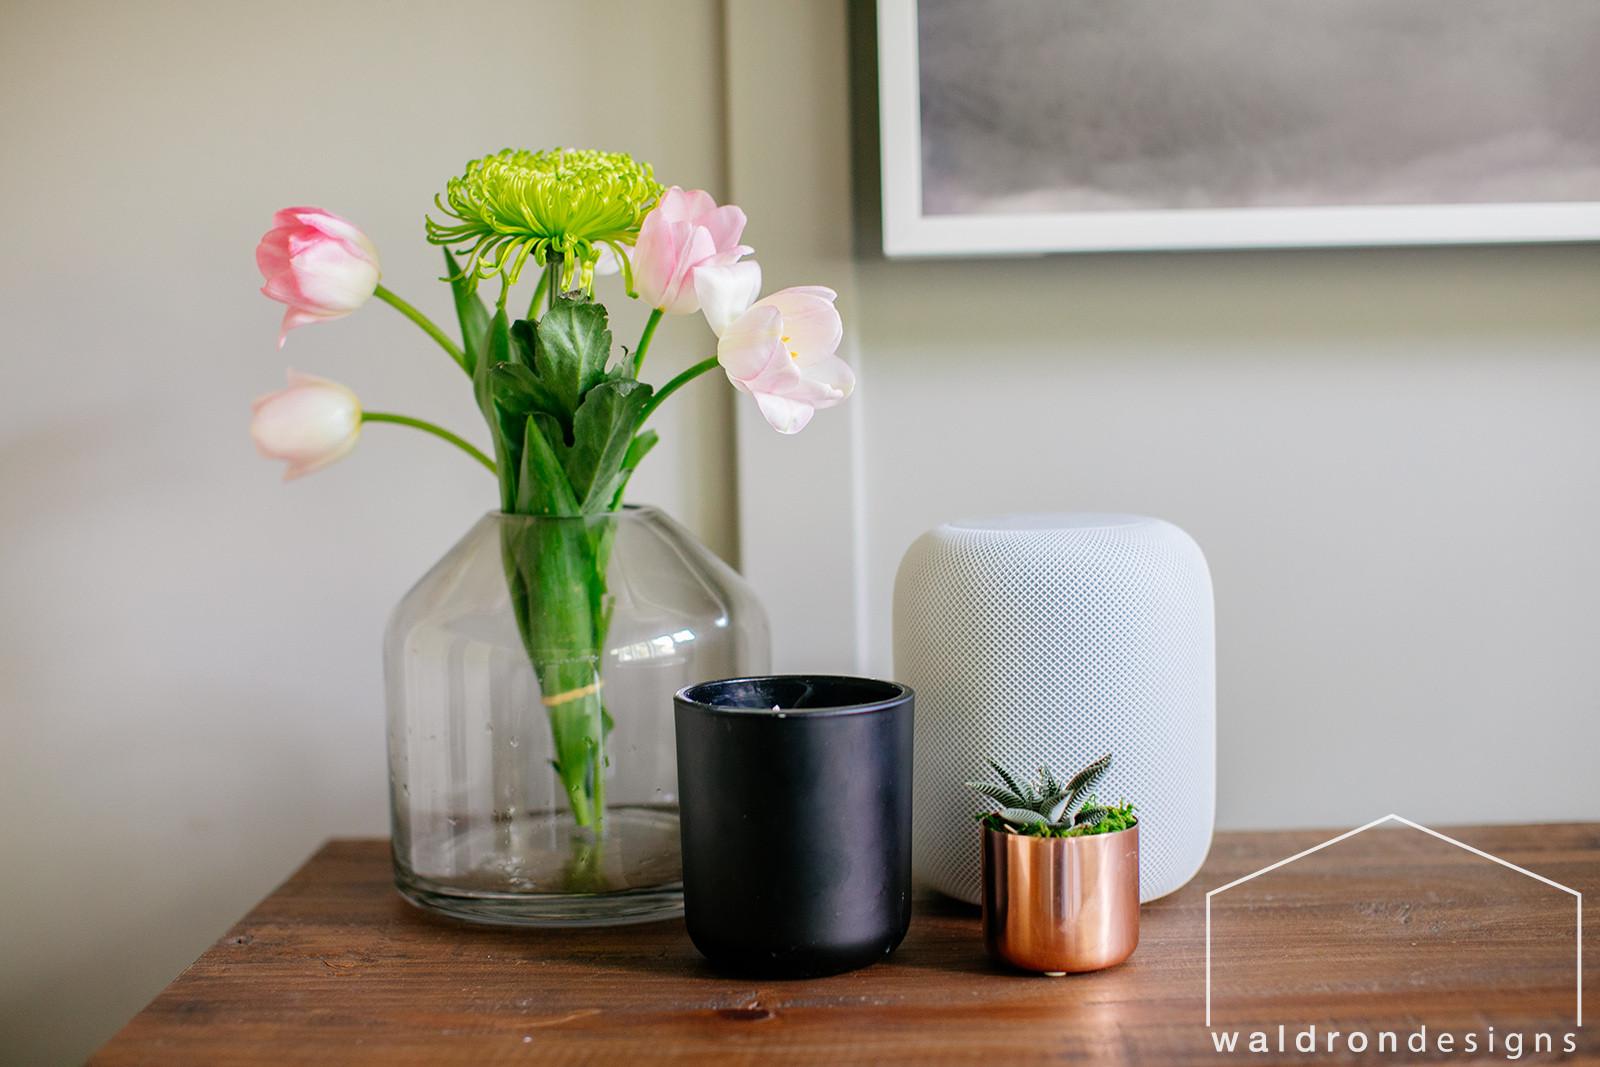 using-plants-to-warm-up-cool-spaces-vashon-seattle-tacoma-interior-designer-waldron-designs.jpg